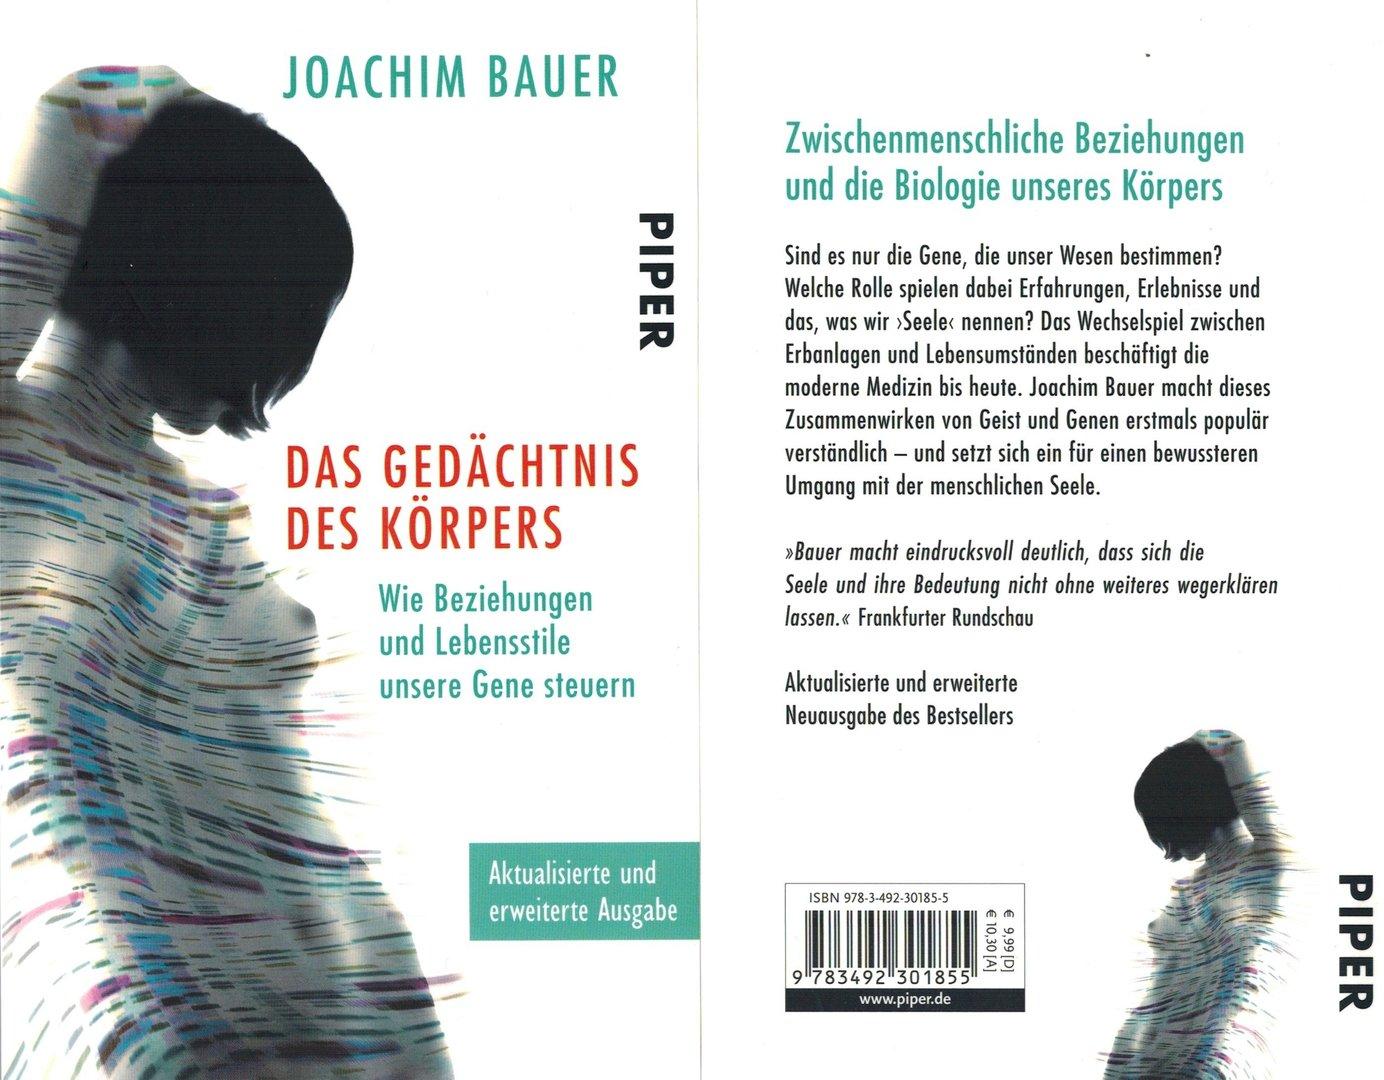 Joachim Bauer Bücher